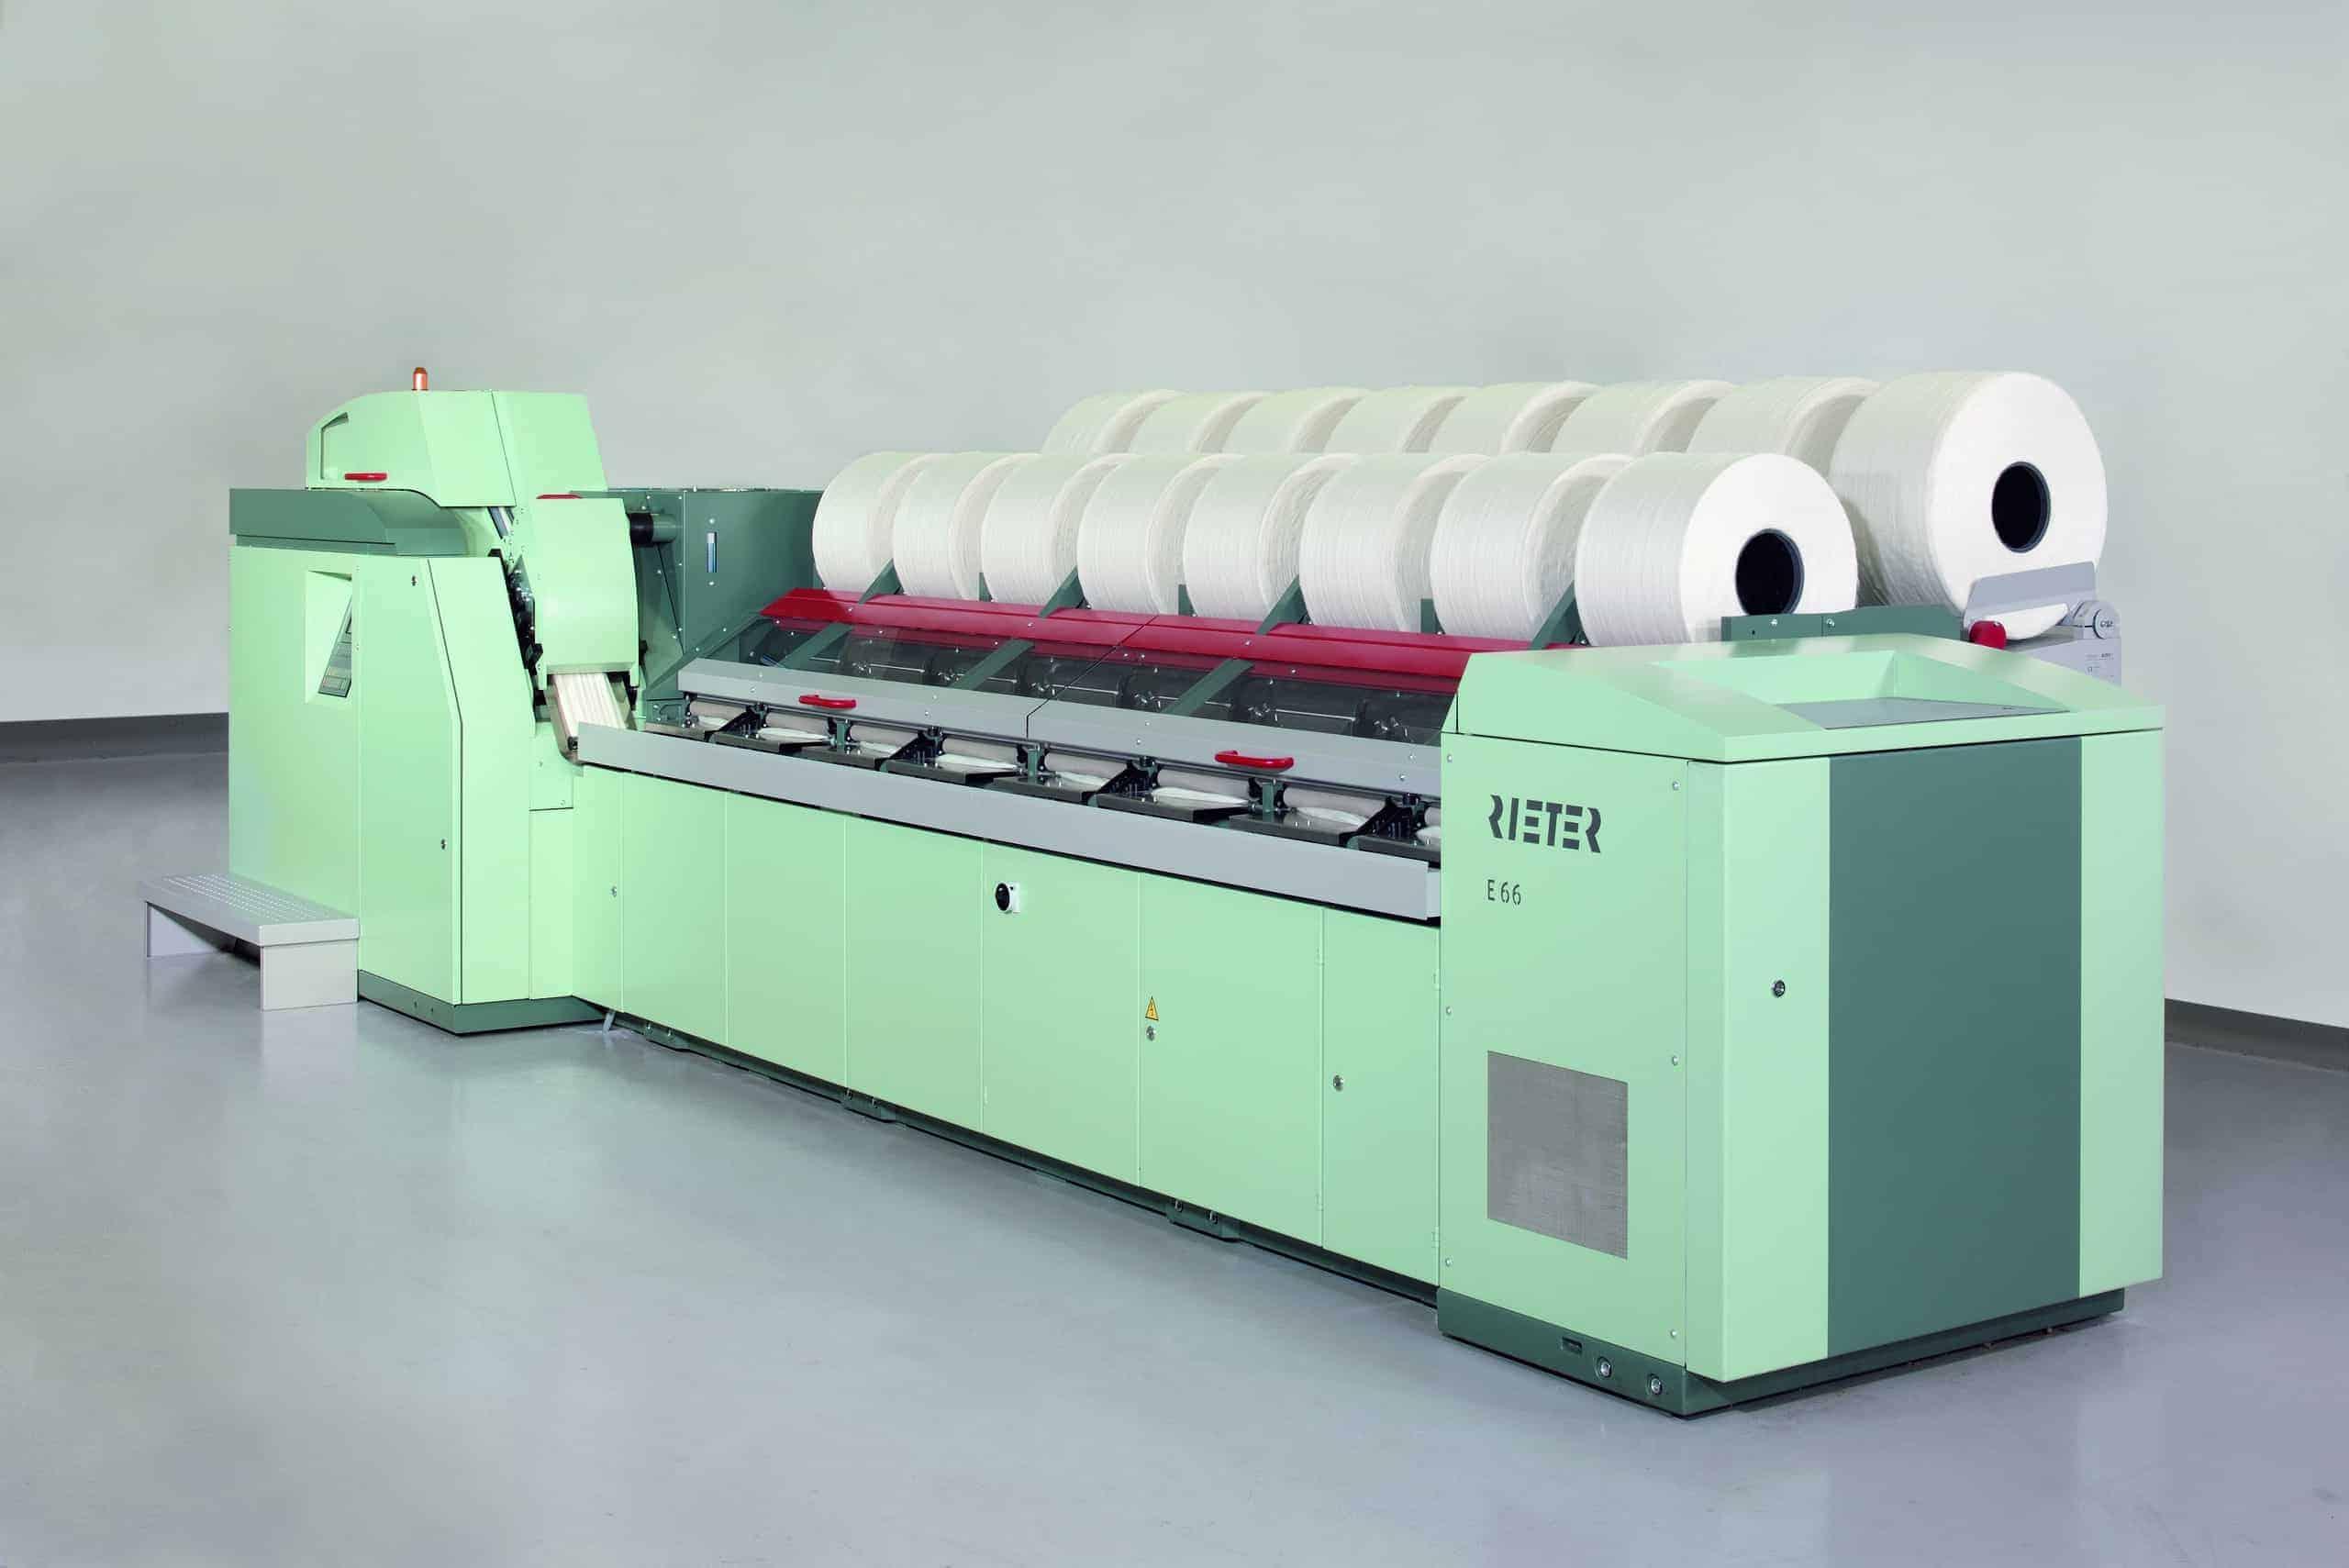 Rieter Machine Works Ltd